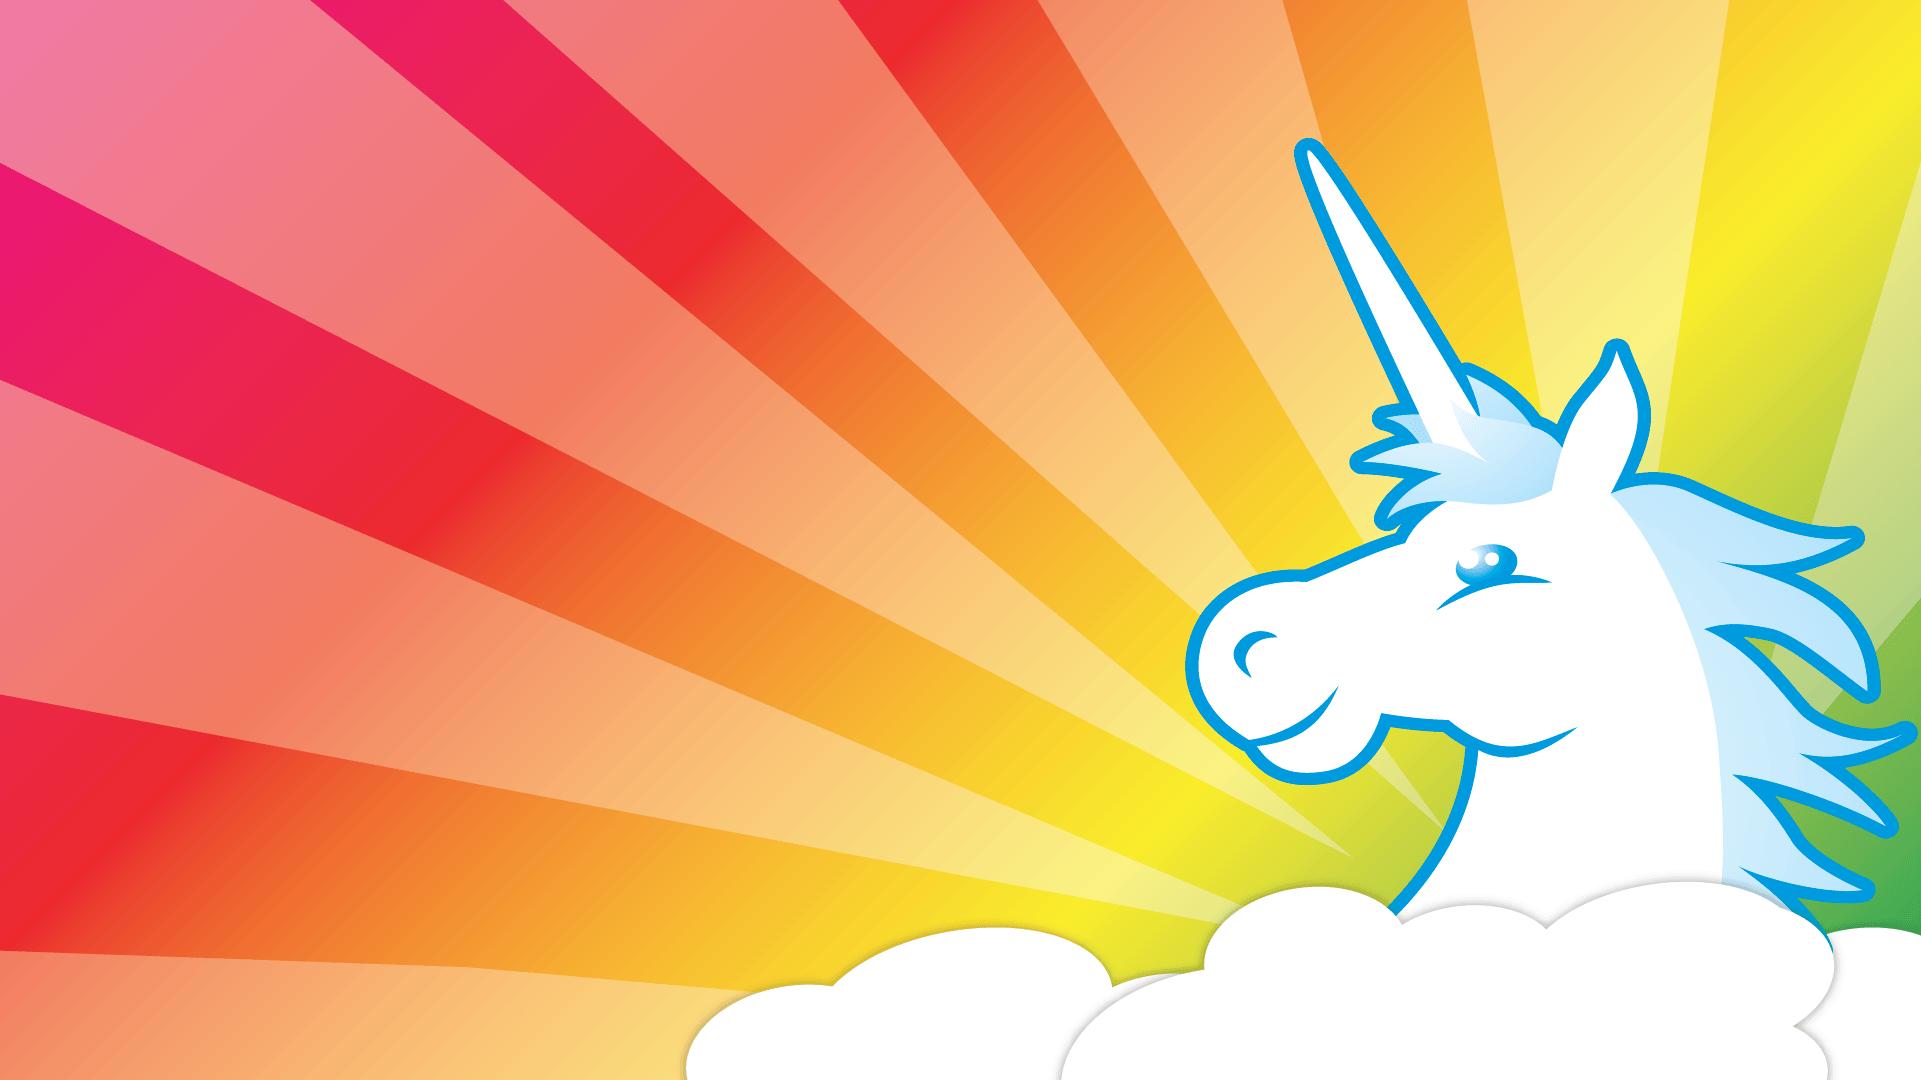 Unicorn Rainbow Desktop Wallpapers Top Free Unicorn Rainbow Desktop Backgrounds Wallpaperaccess